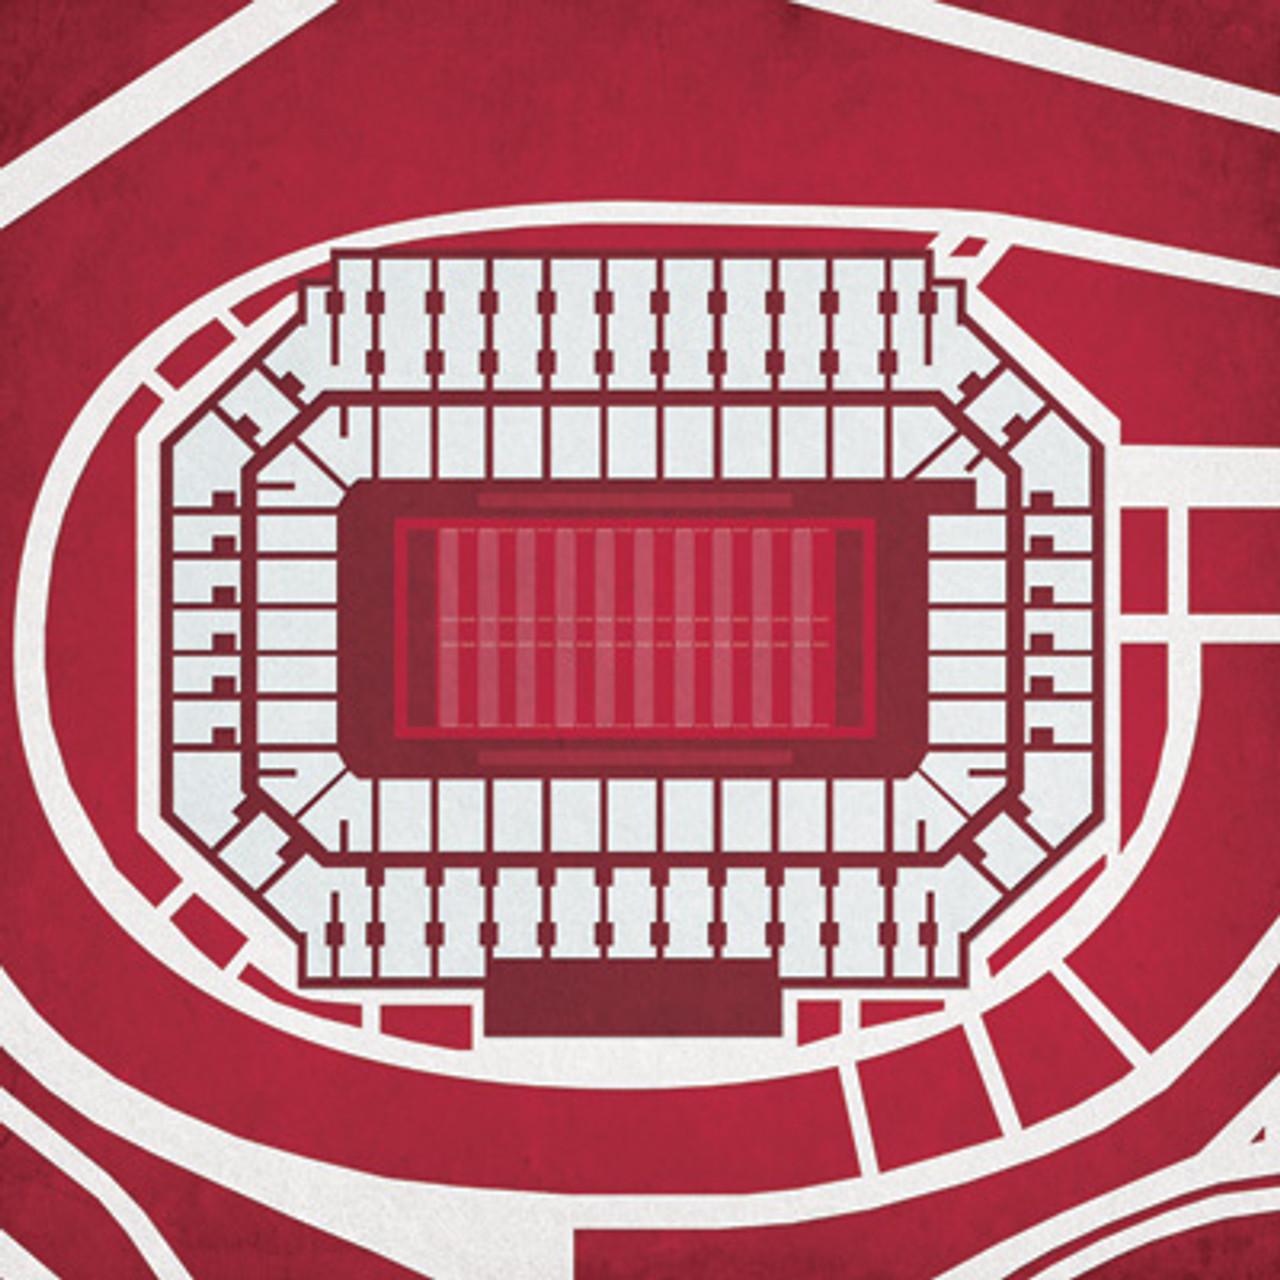 Stanford Cardinal - Stanford Stadium City Print